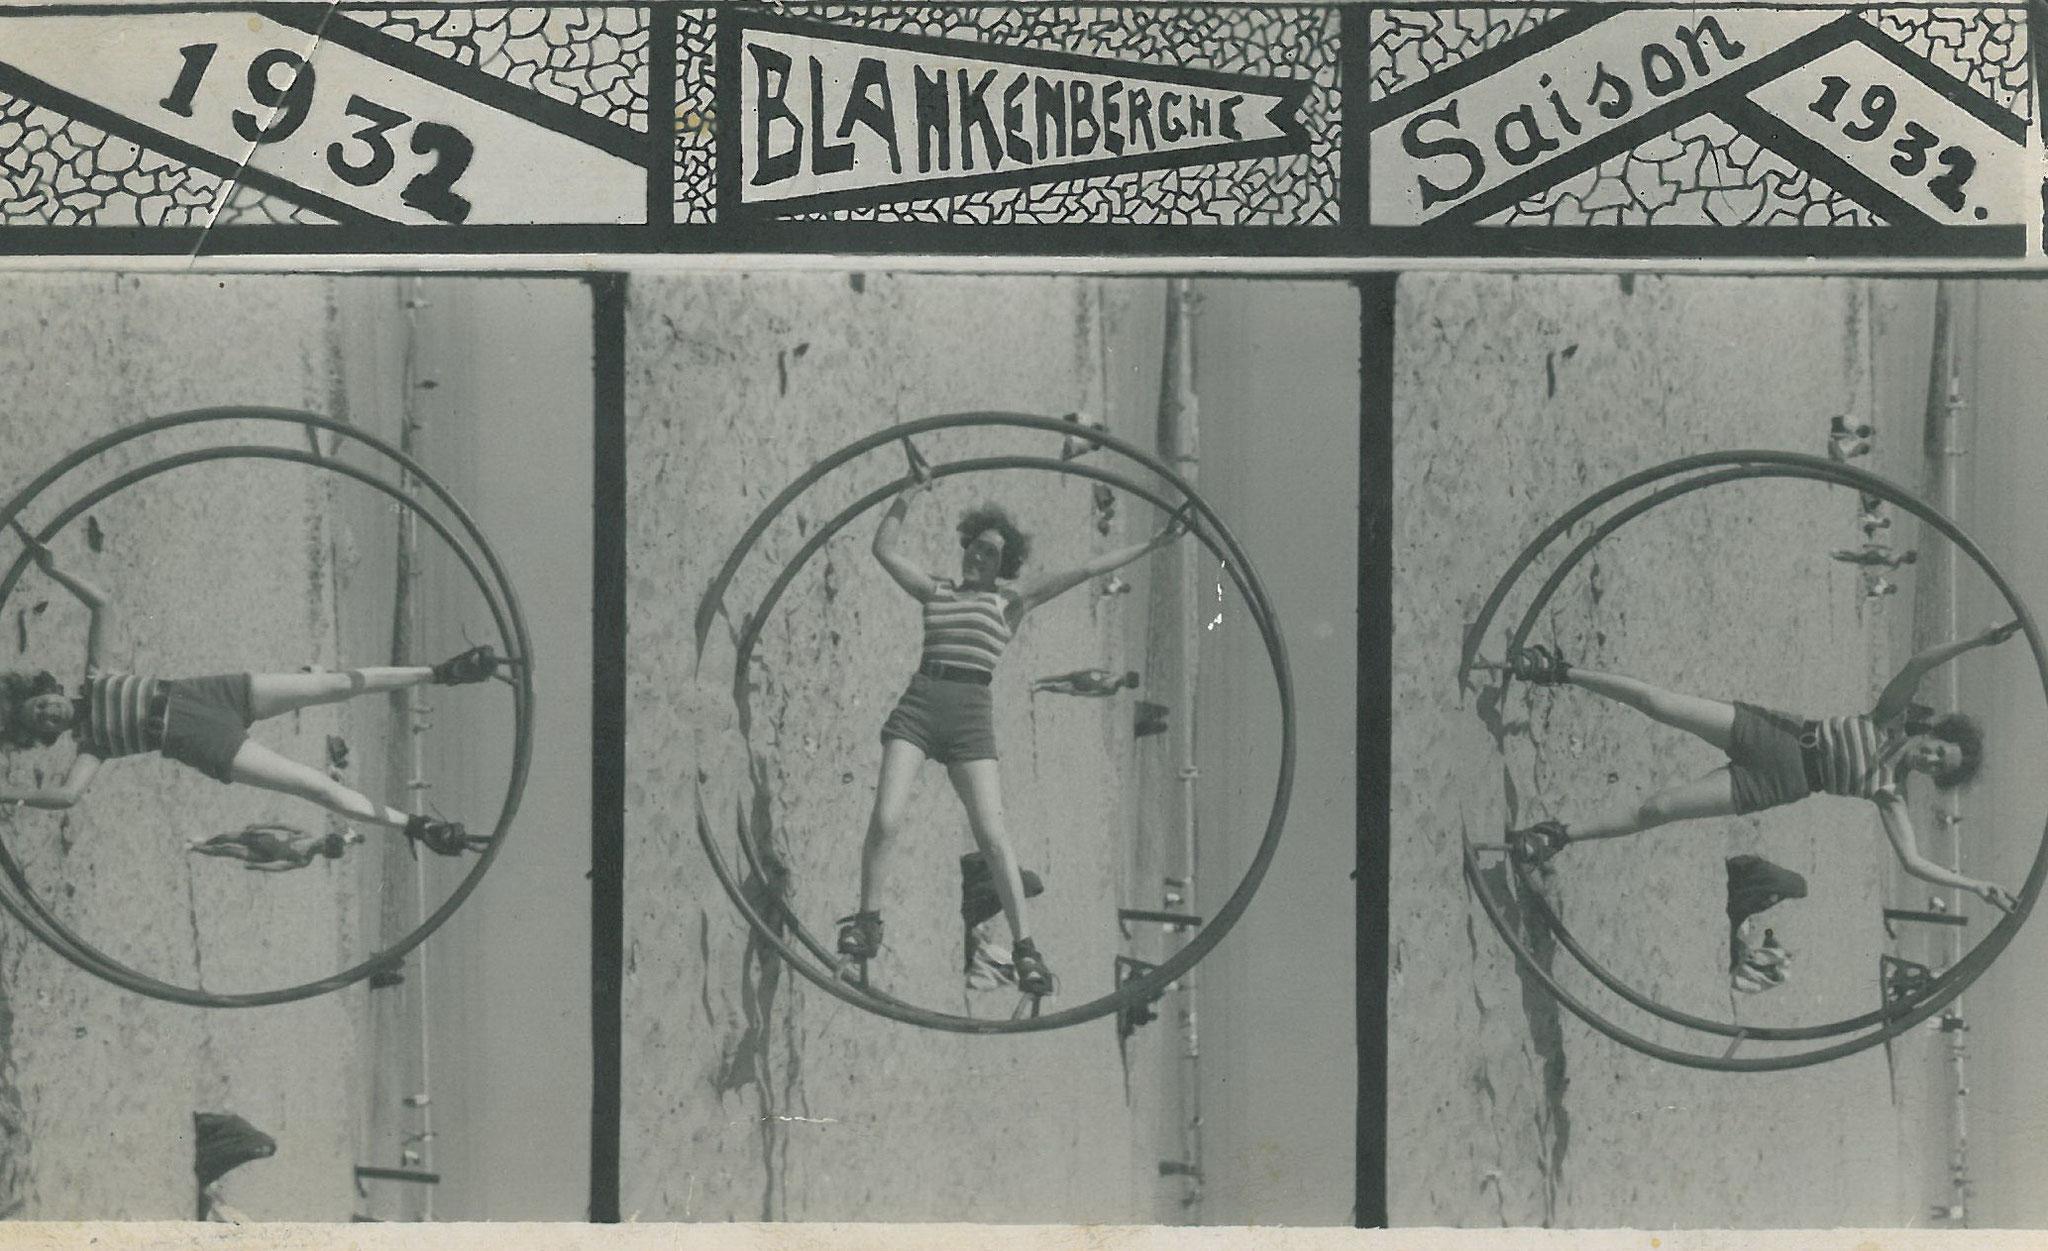 Martha im Rönrad in Blankenberge 1932